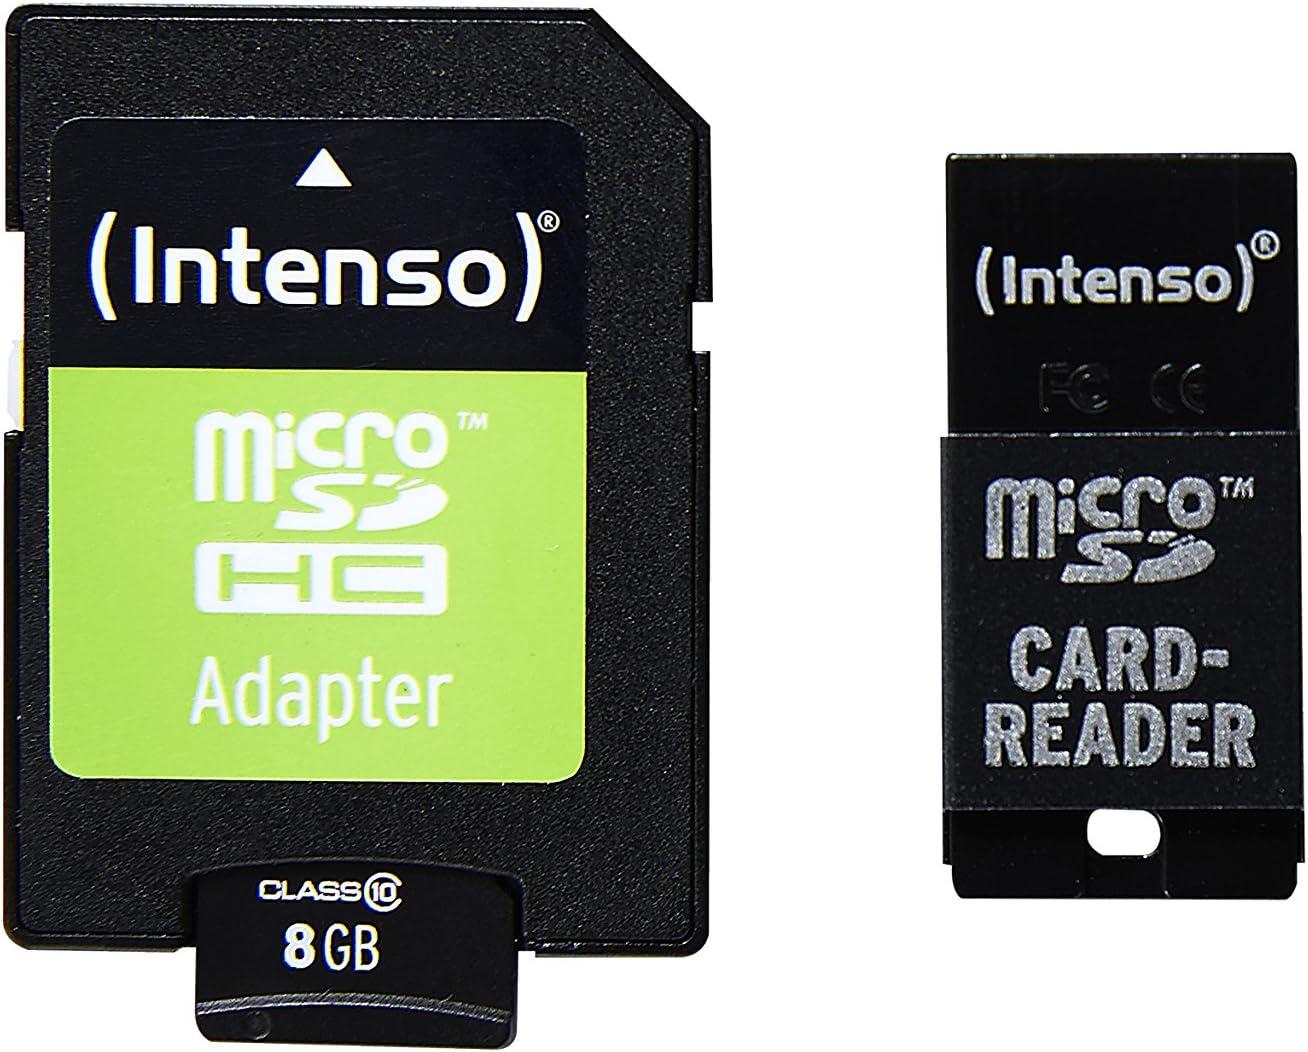 Intenso Class 10 Micro Sdhc 16gb Speicherkarte Inkl Sd Computer Zubehör